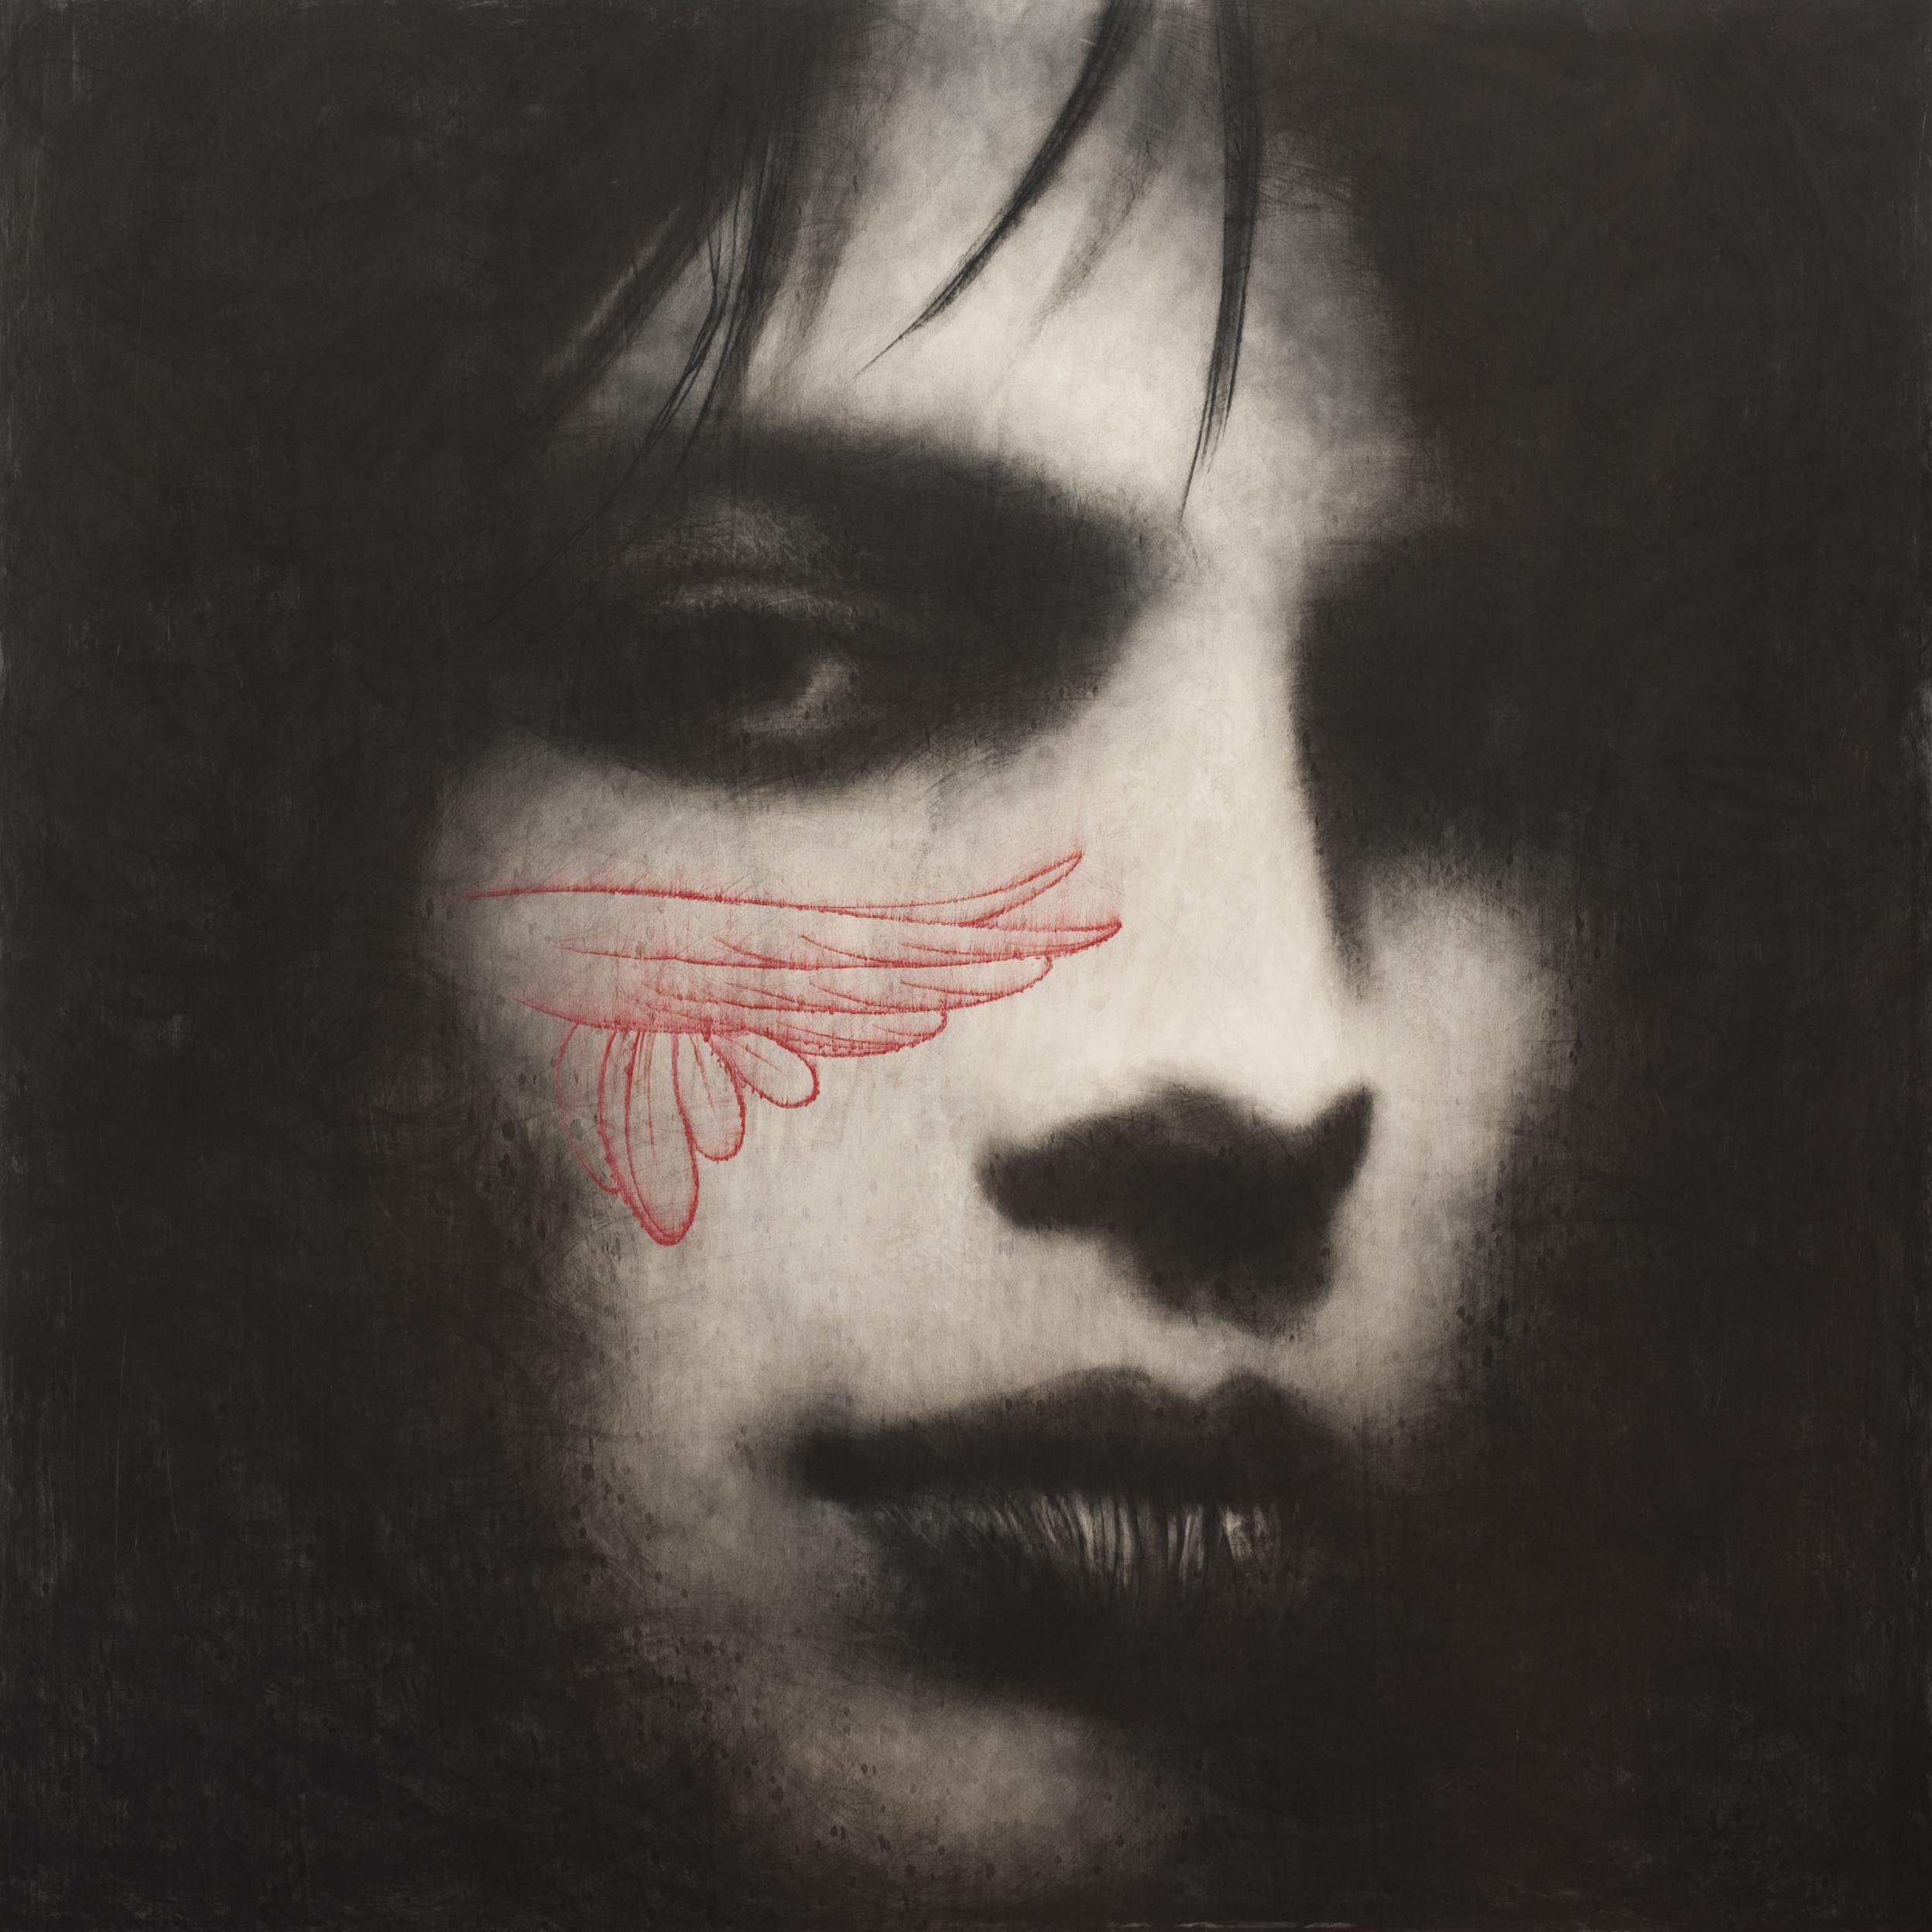 Omar Galliani, Nuovì Fiori, Nuovi Santi, 2012 matita nera su tavola + pastelli cm 180x180